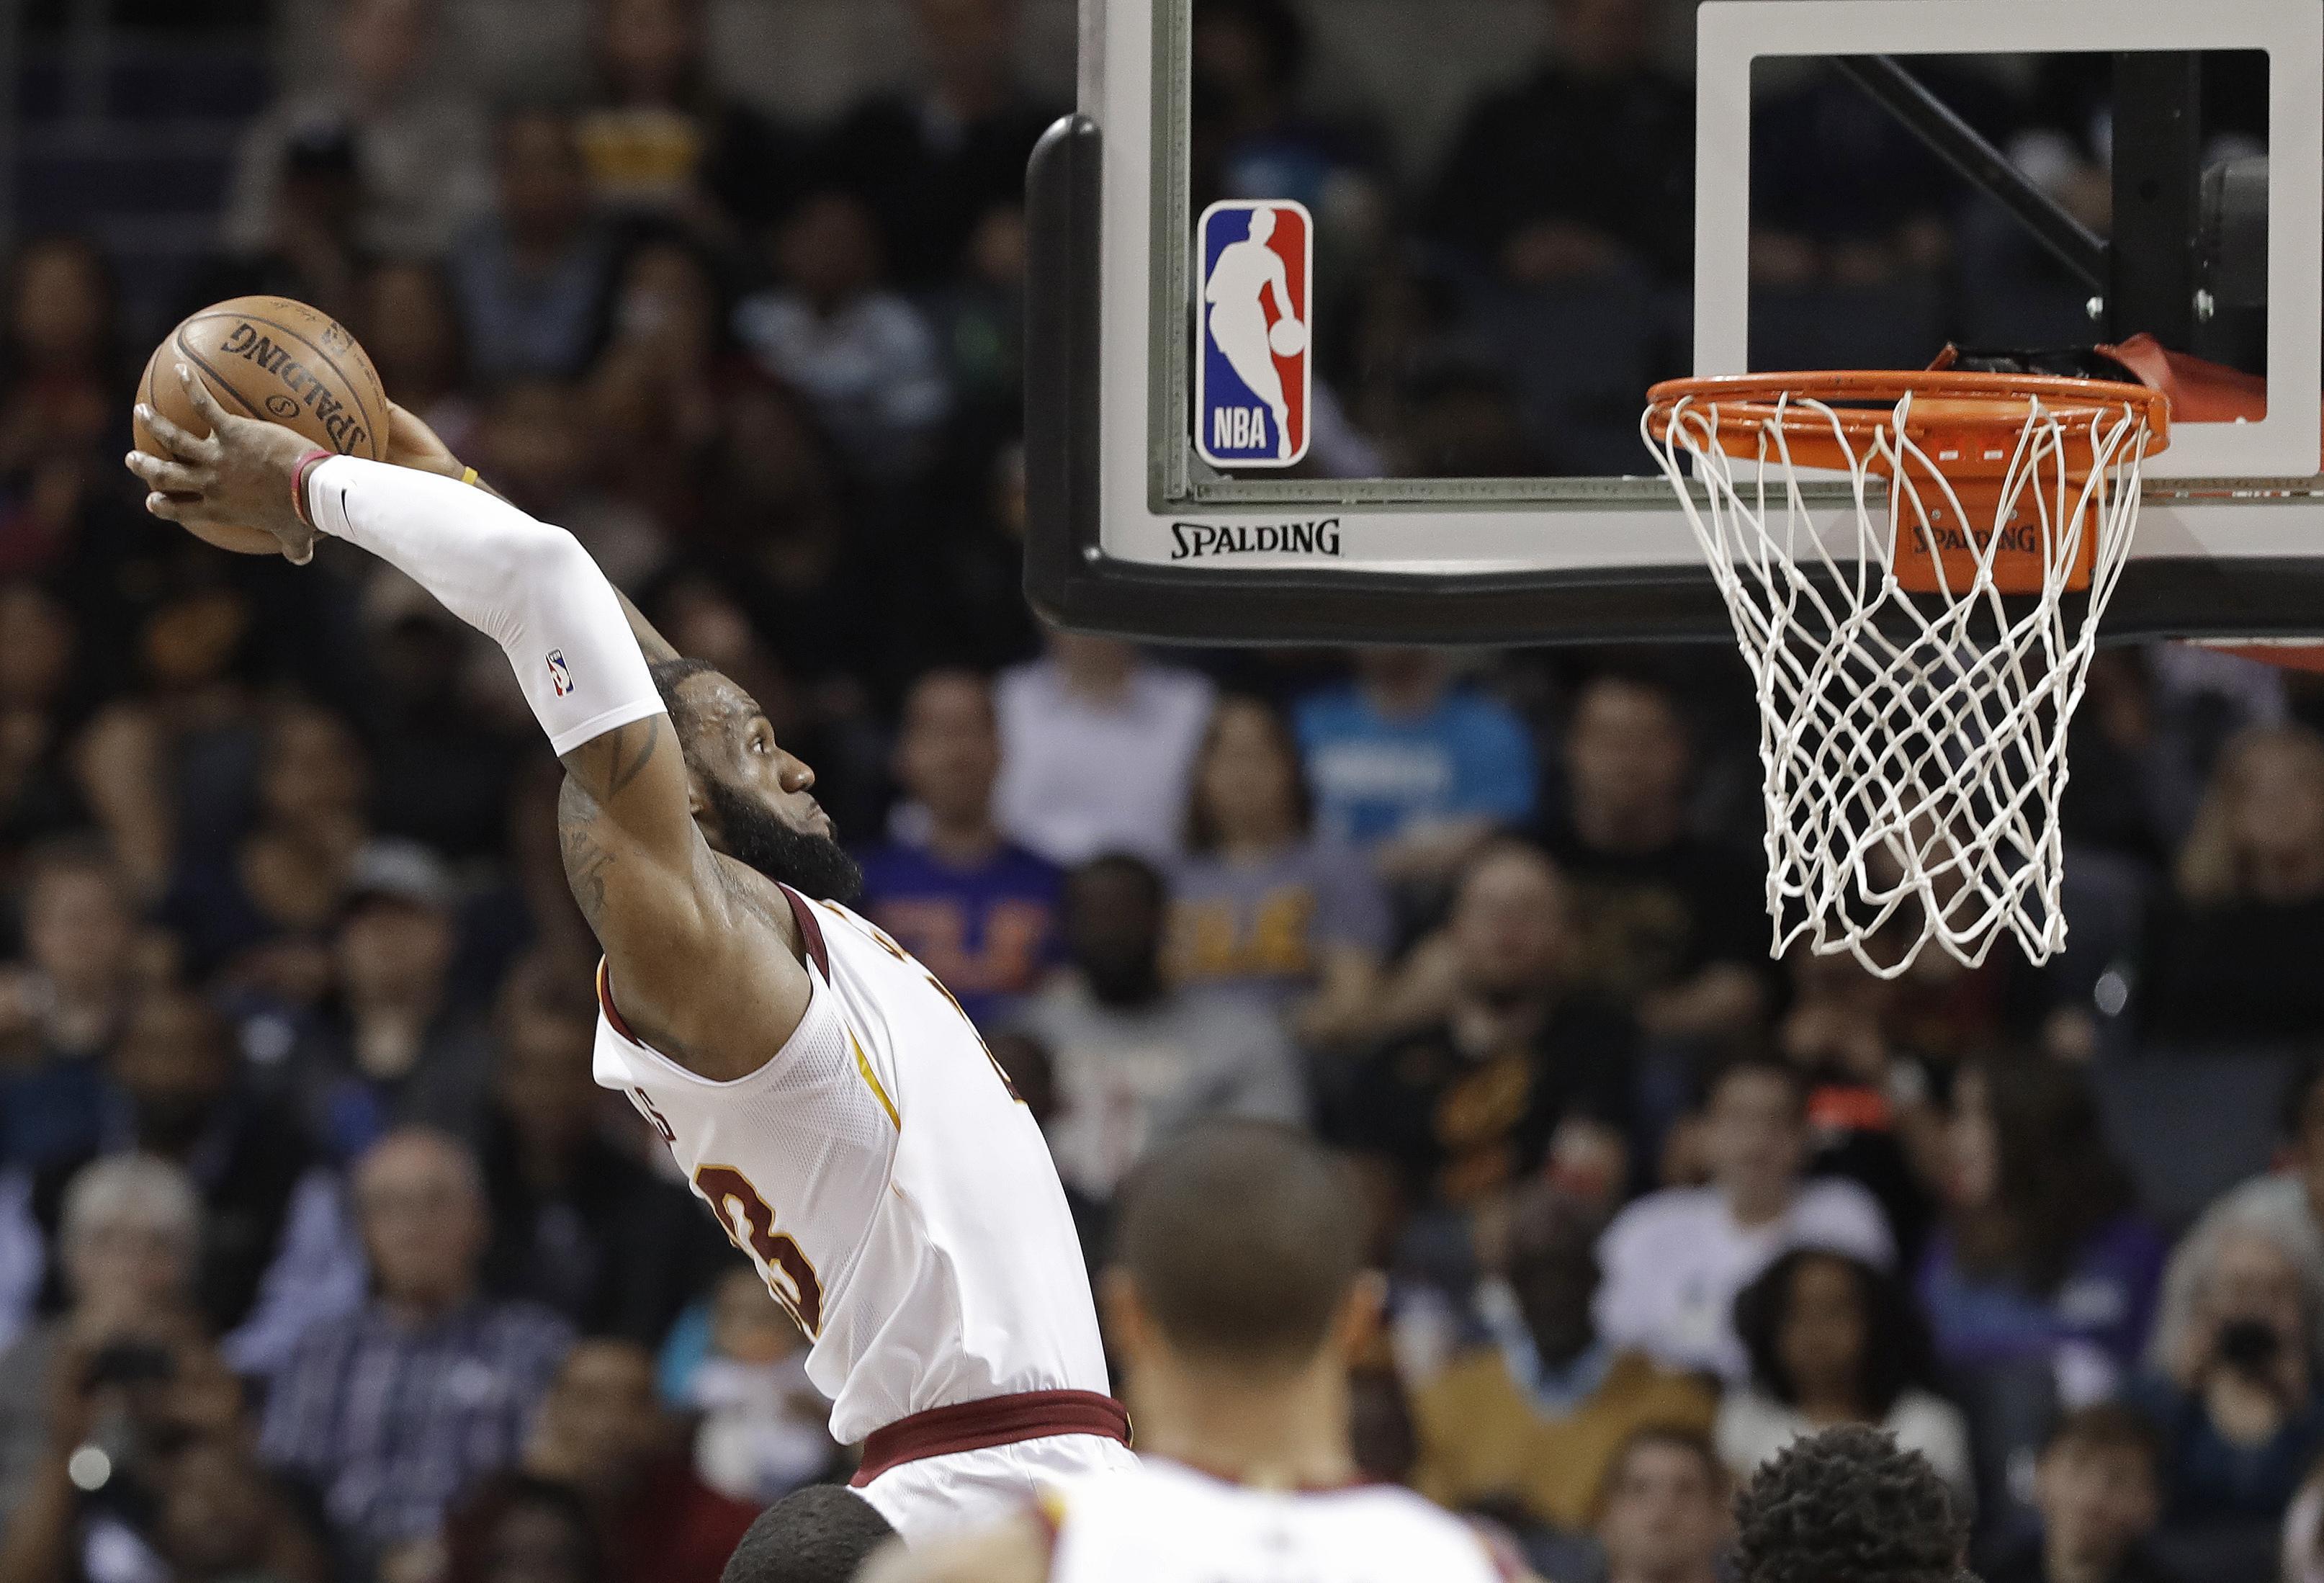 He99 Lebron James Dunk Nba Sports Art Basketball: Sources: LeBron James Declines Option With Cleveland